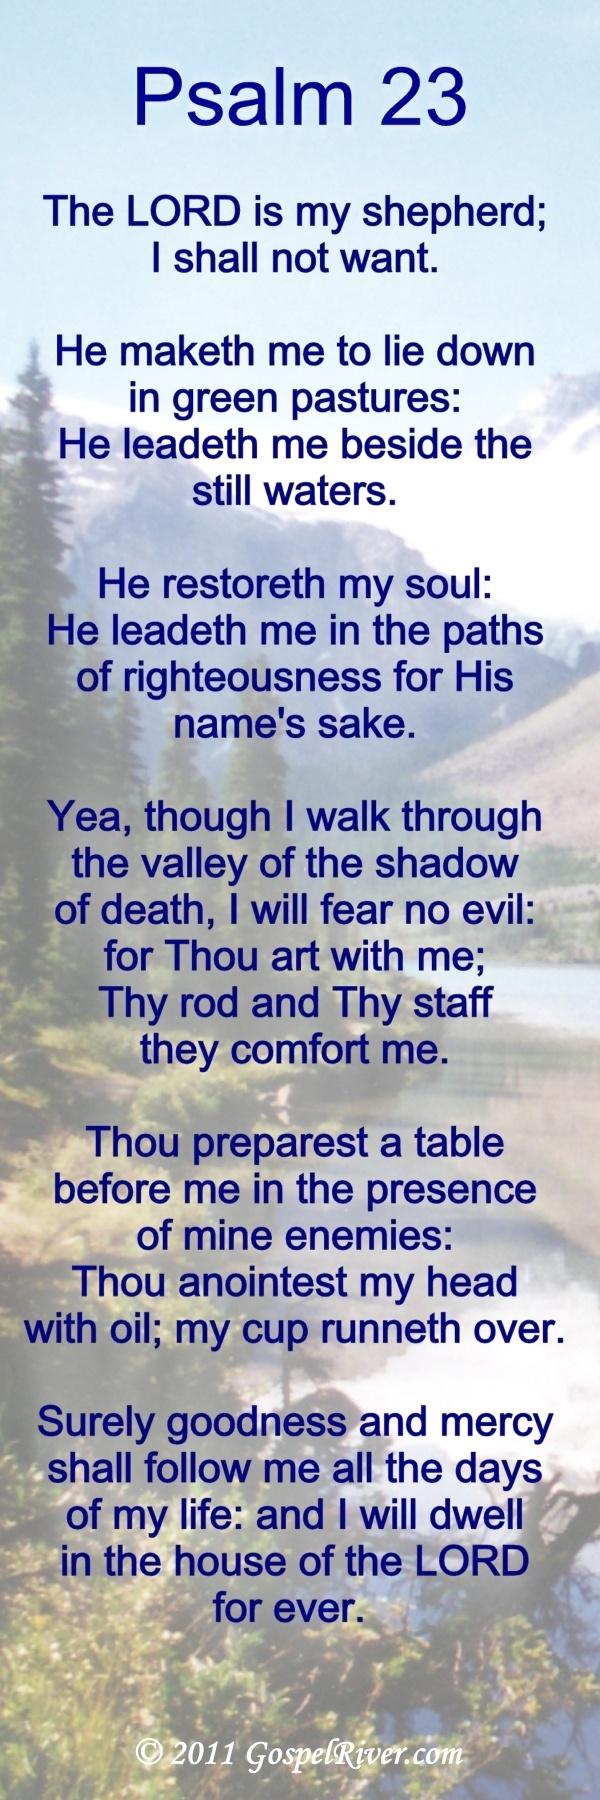 ... in truth. A powerful prayer. Miss you Grandma; Praying for Grandpa